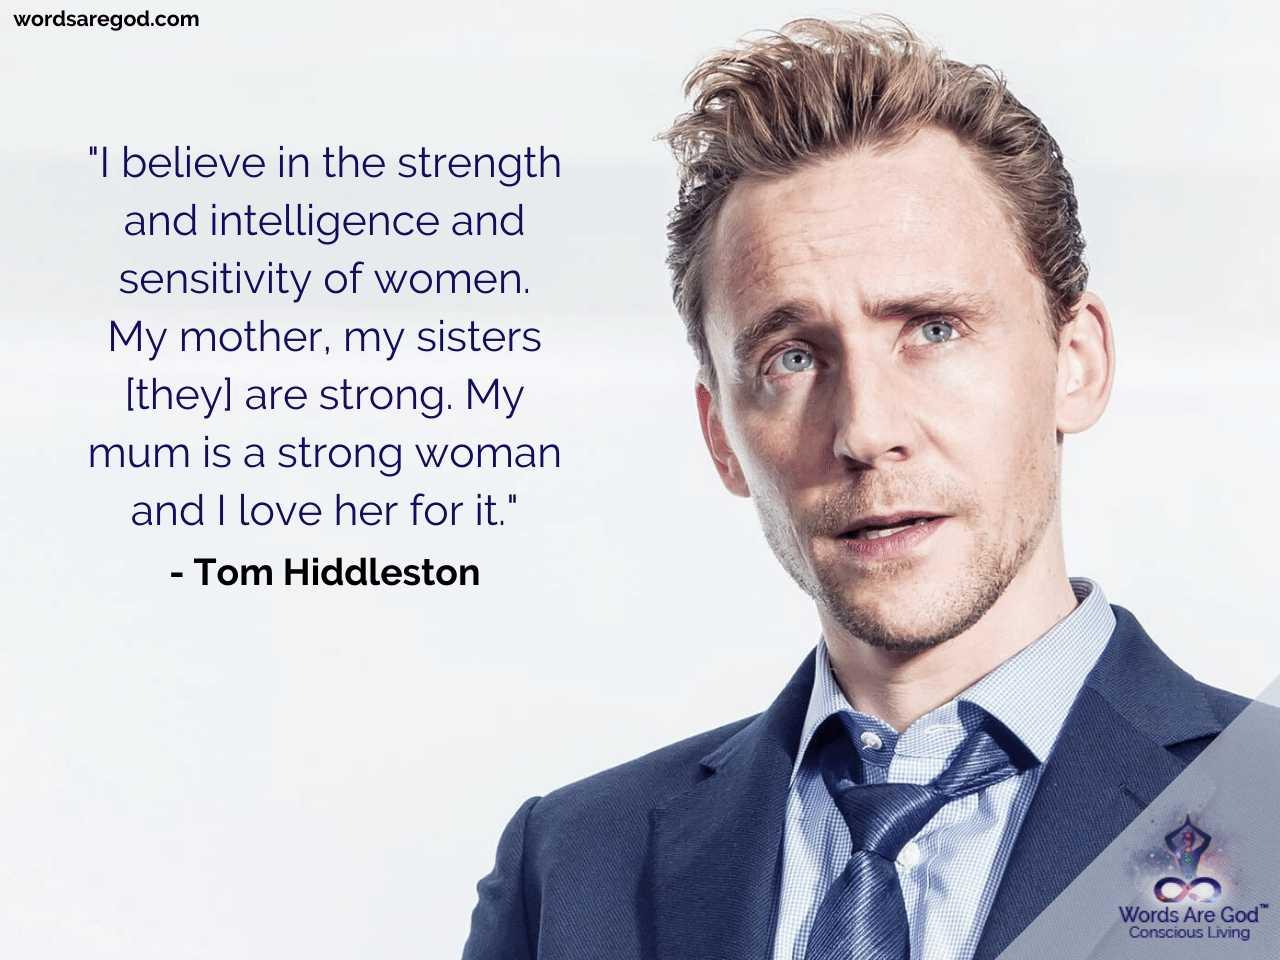 Tom Hiddleston Motivational Quotes